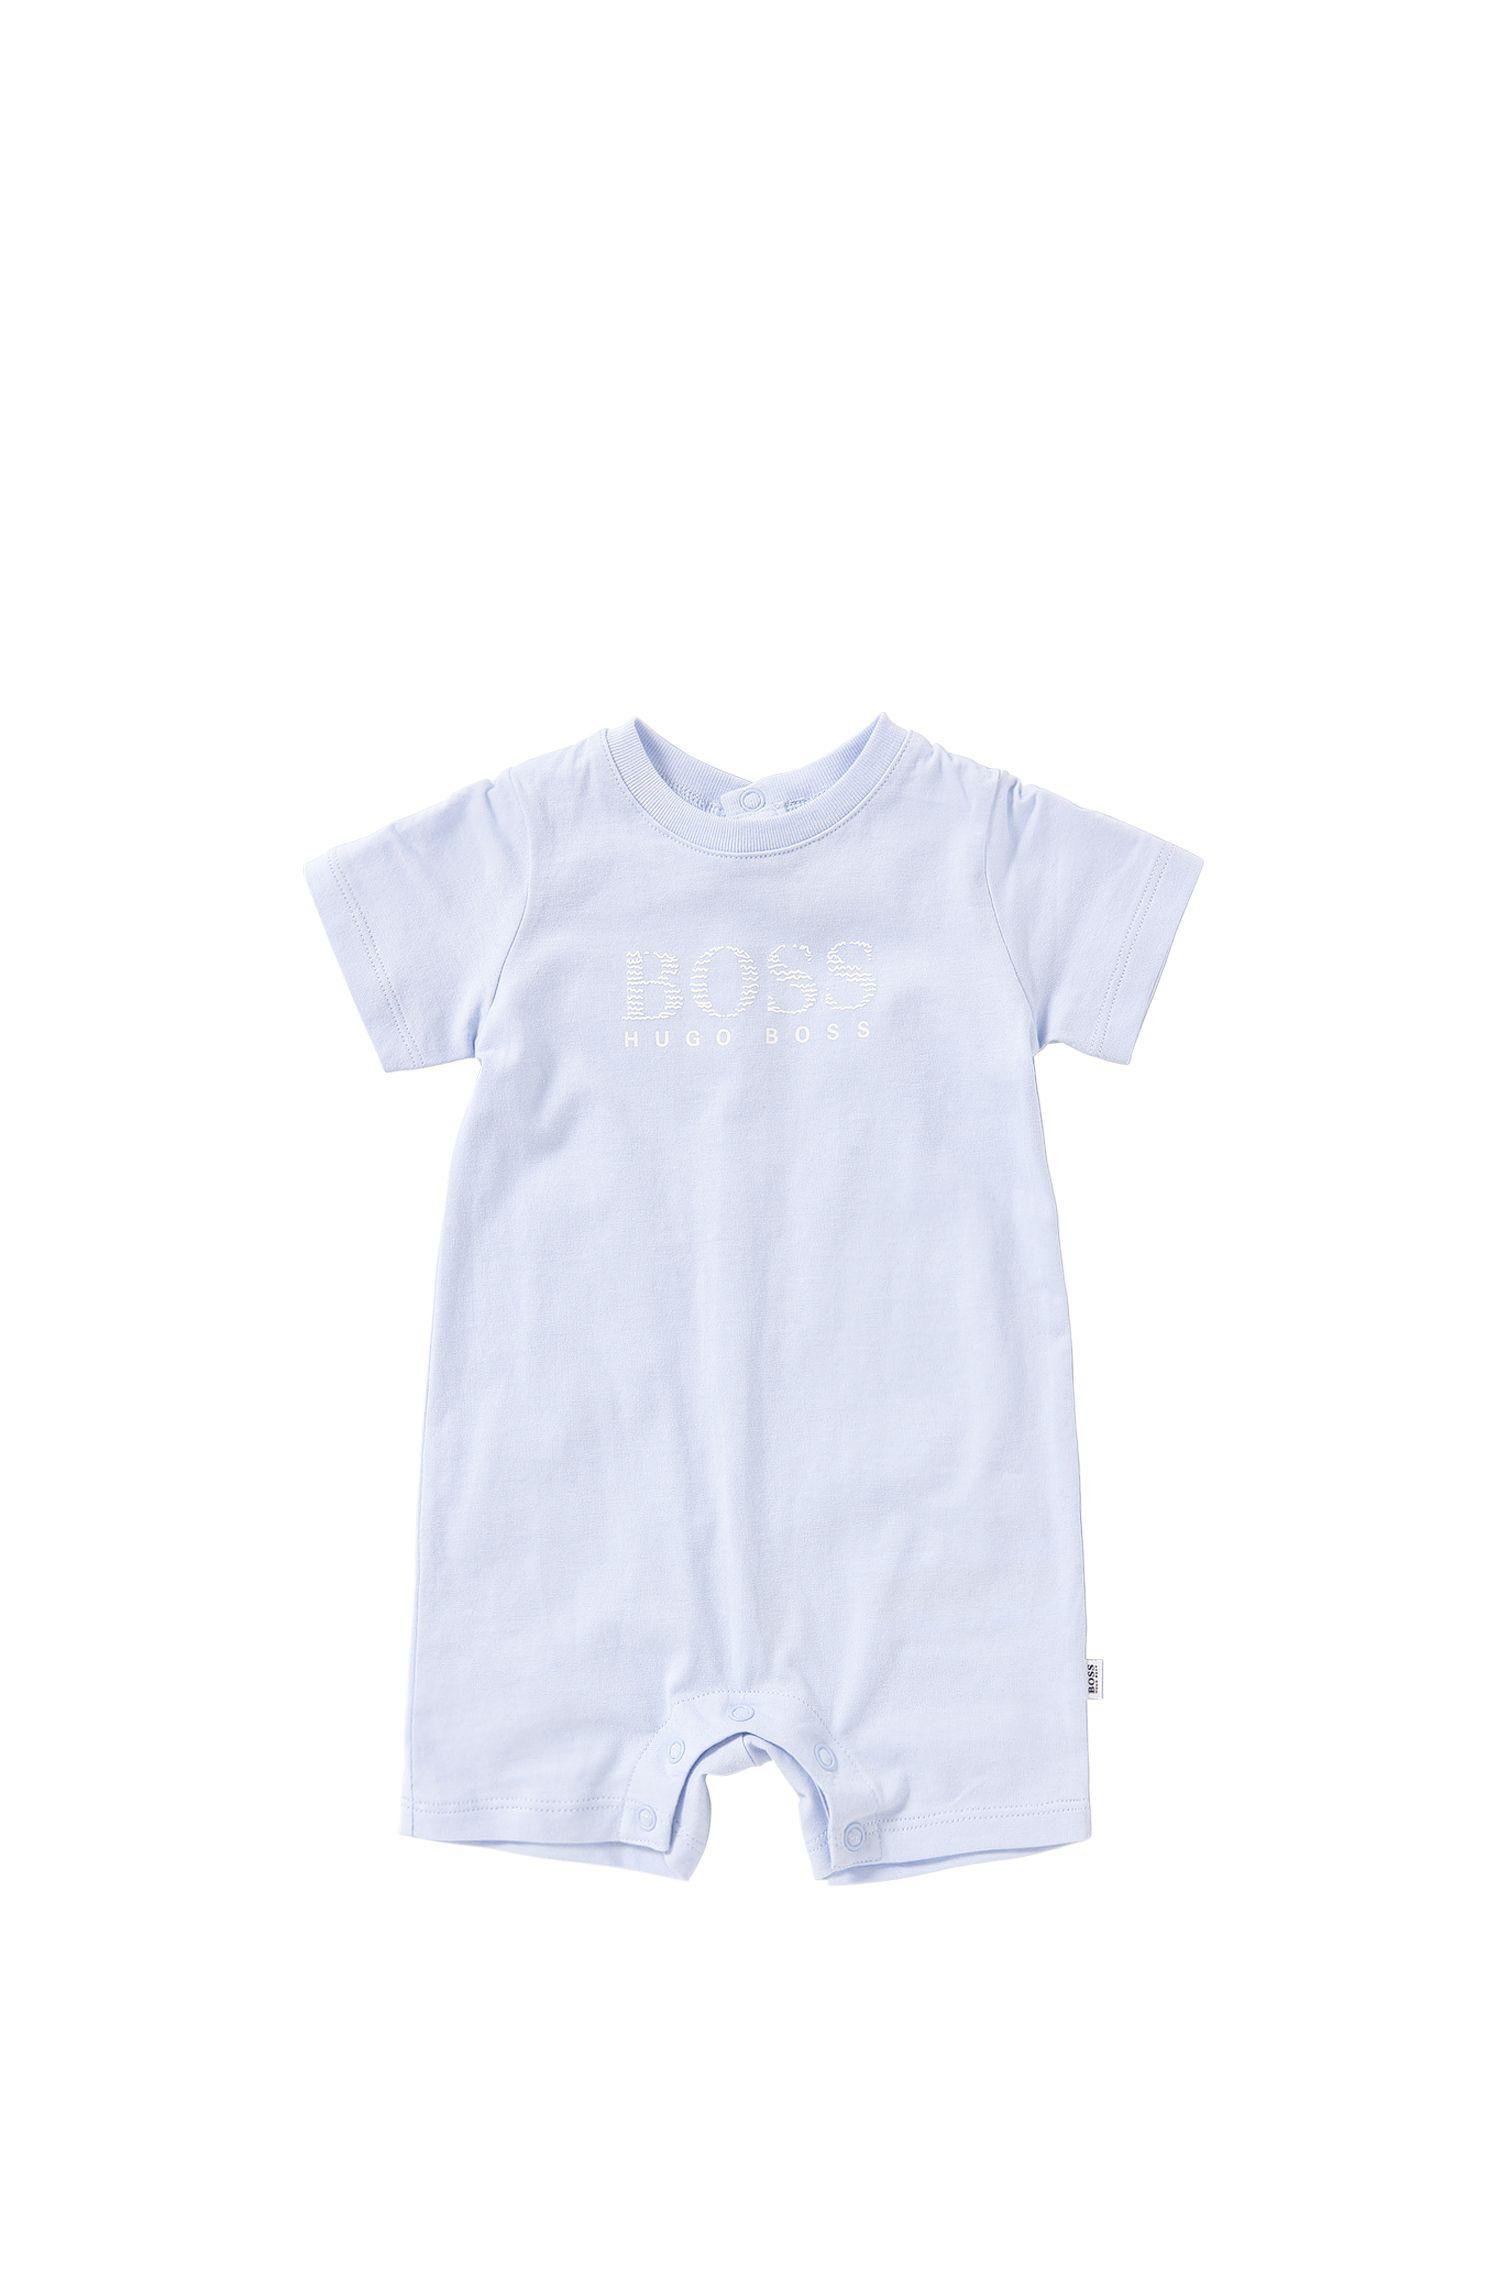 Short newborn's playsuit in cotton: 'J94157'